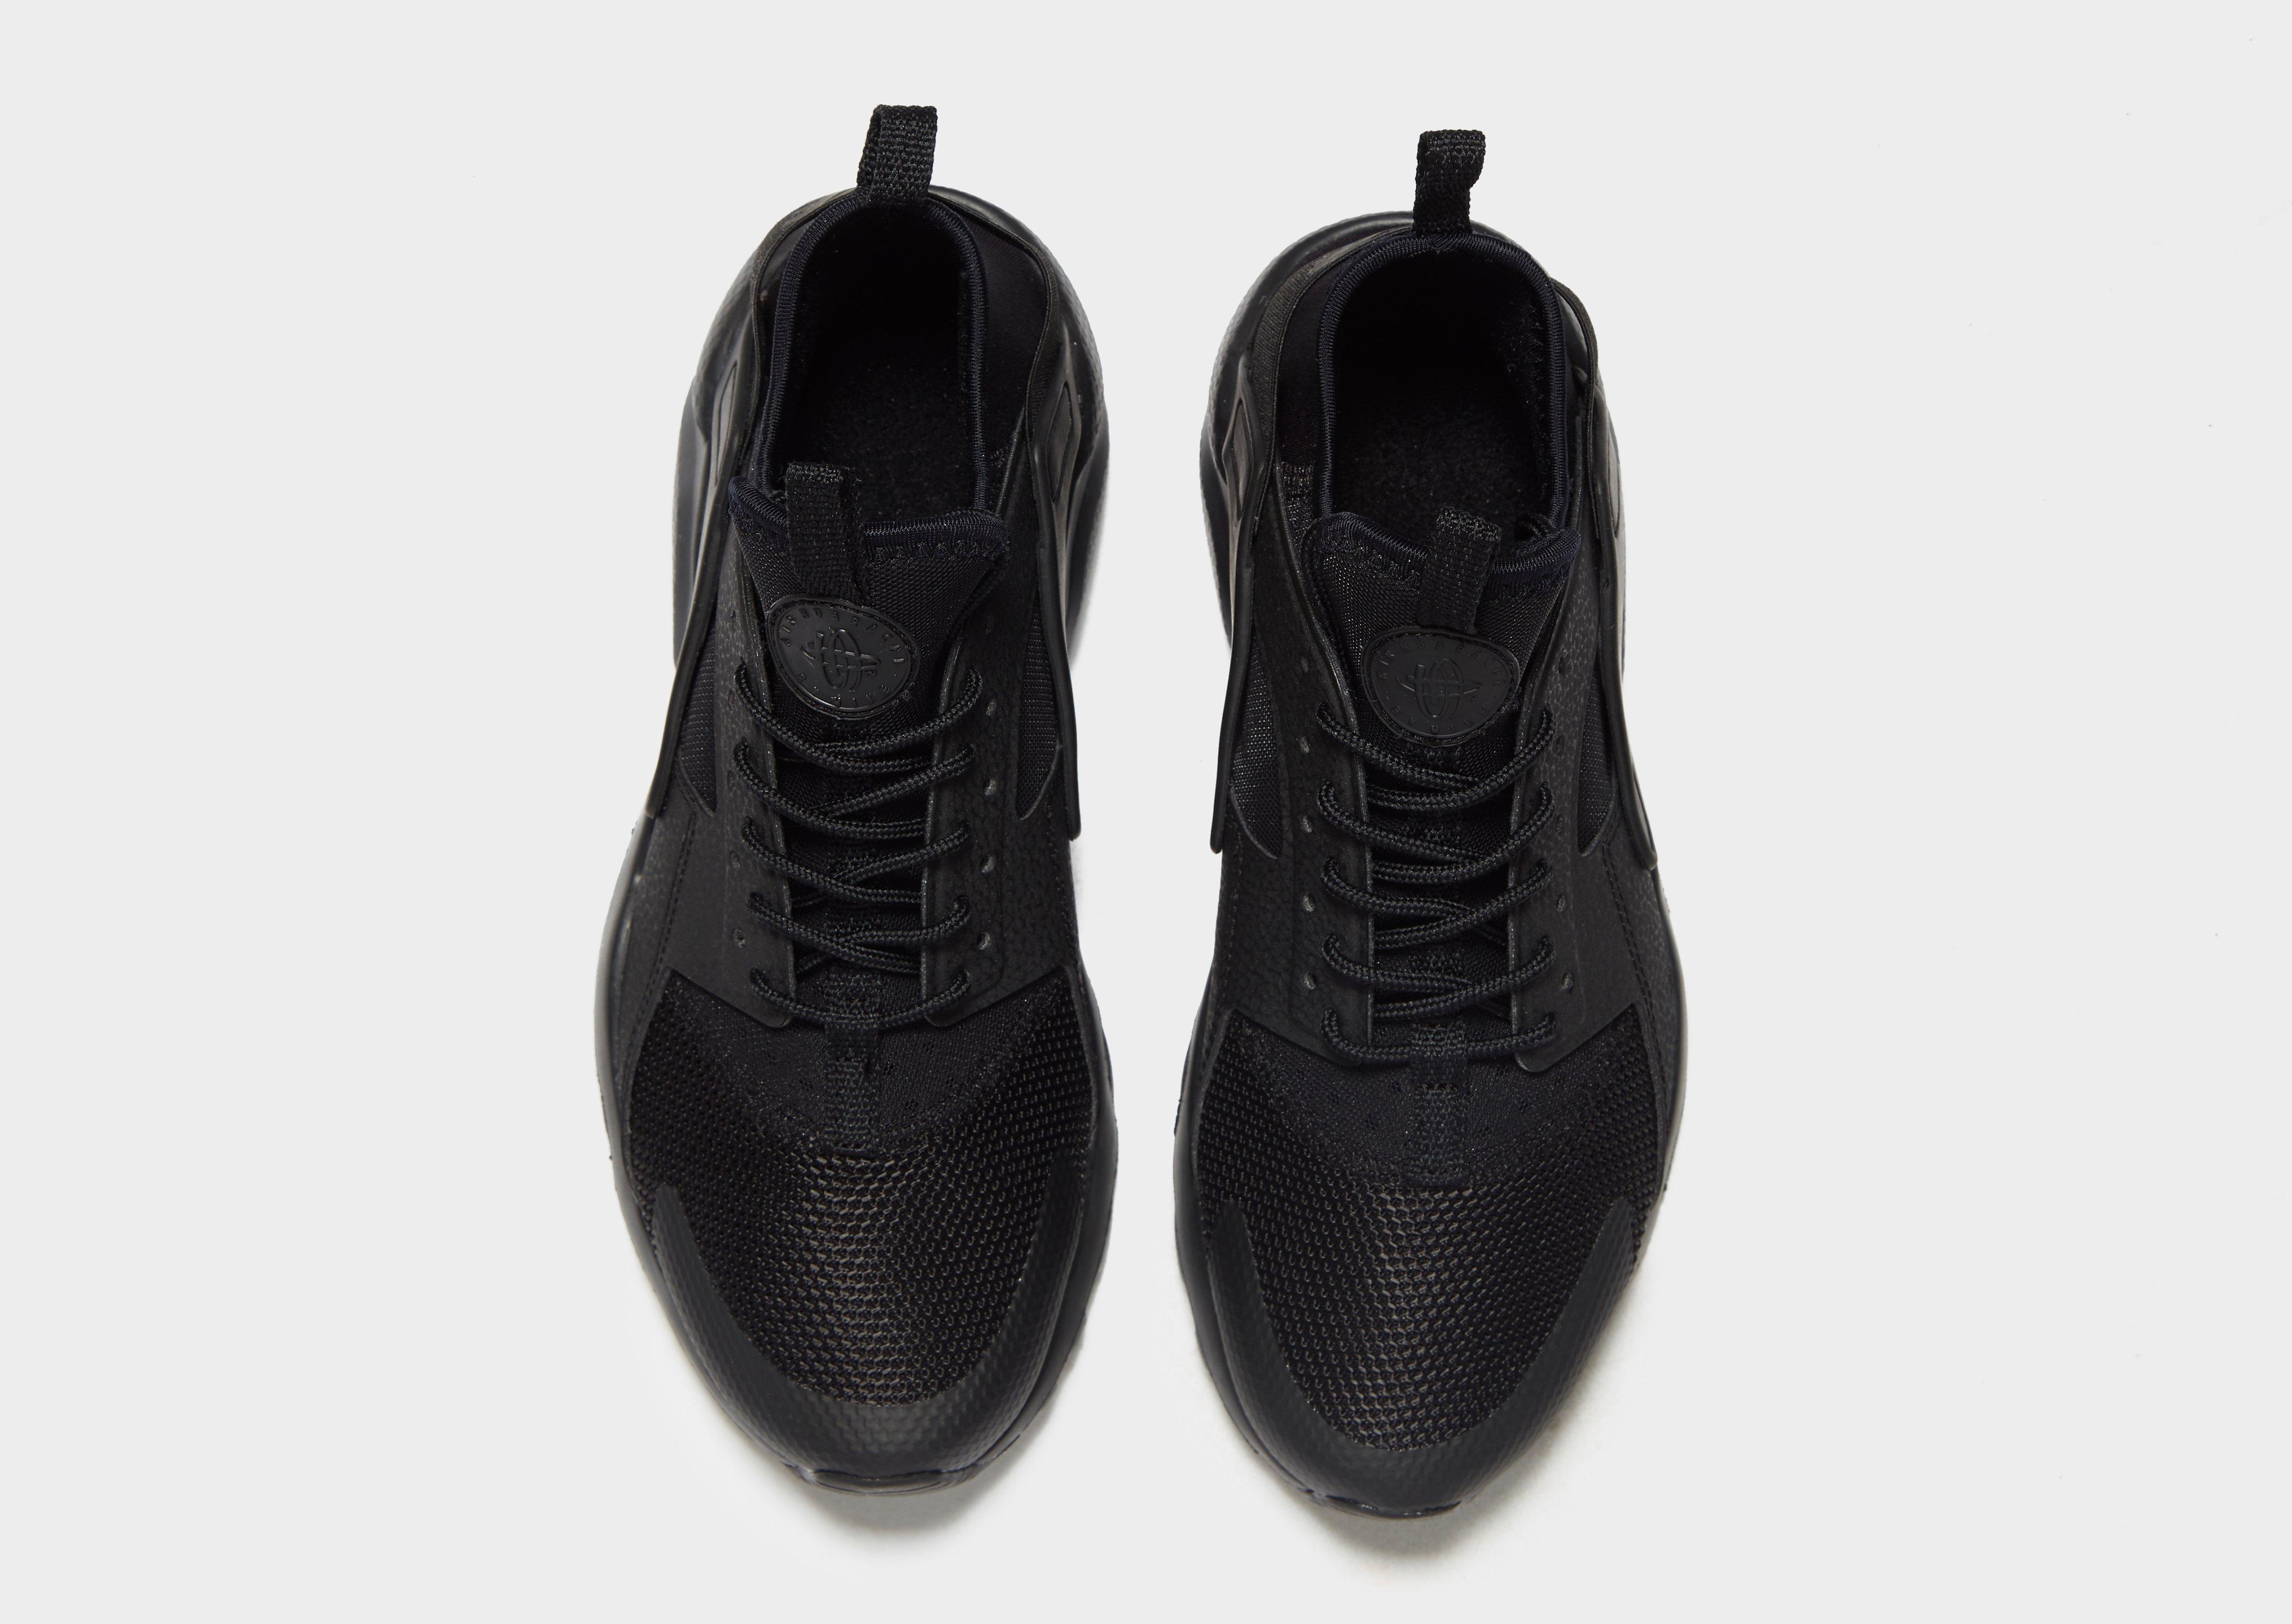 3ddae052c1da3 Nike Air Max 2014 Black Orange Neon